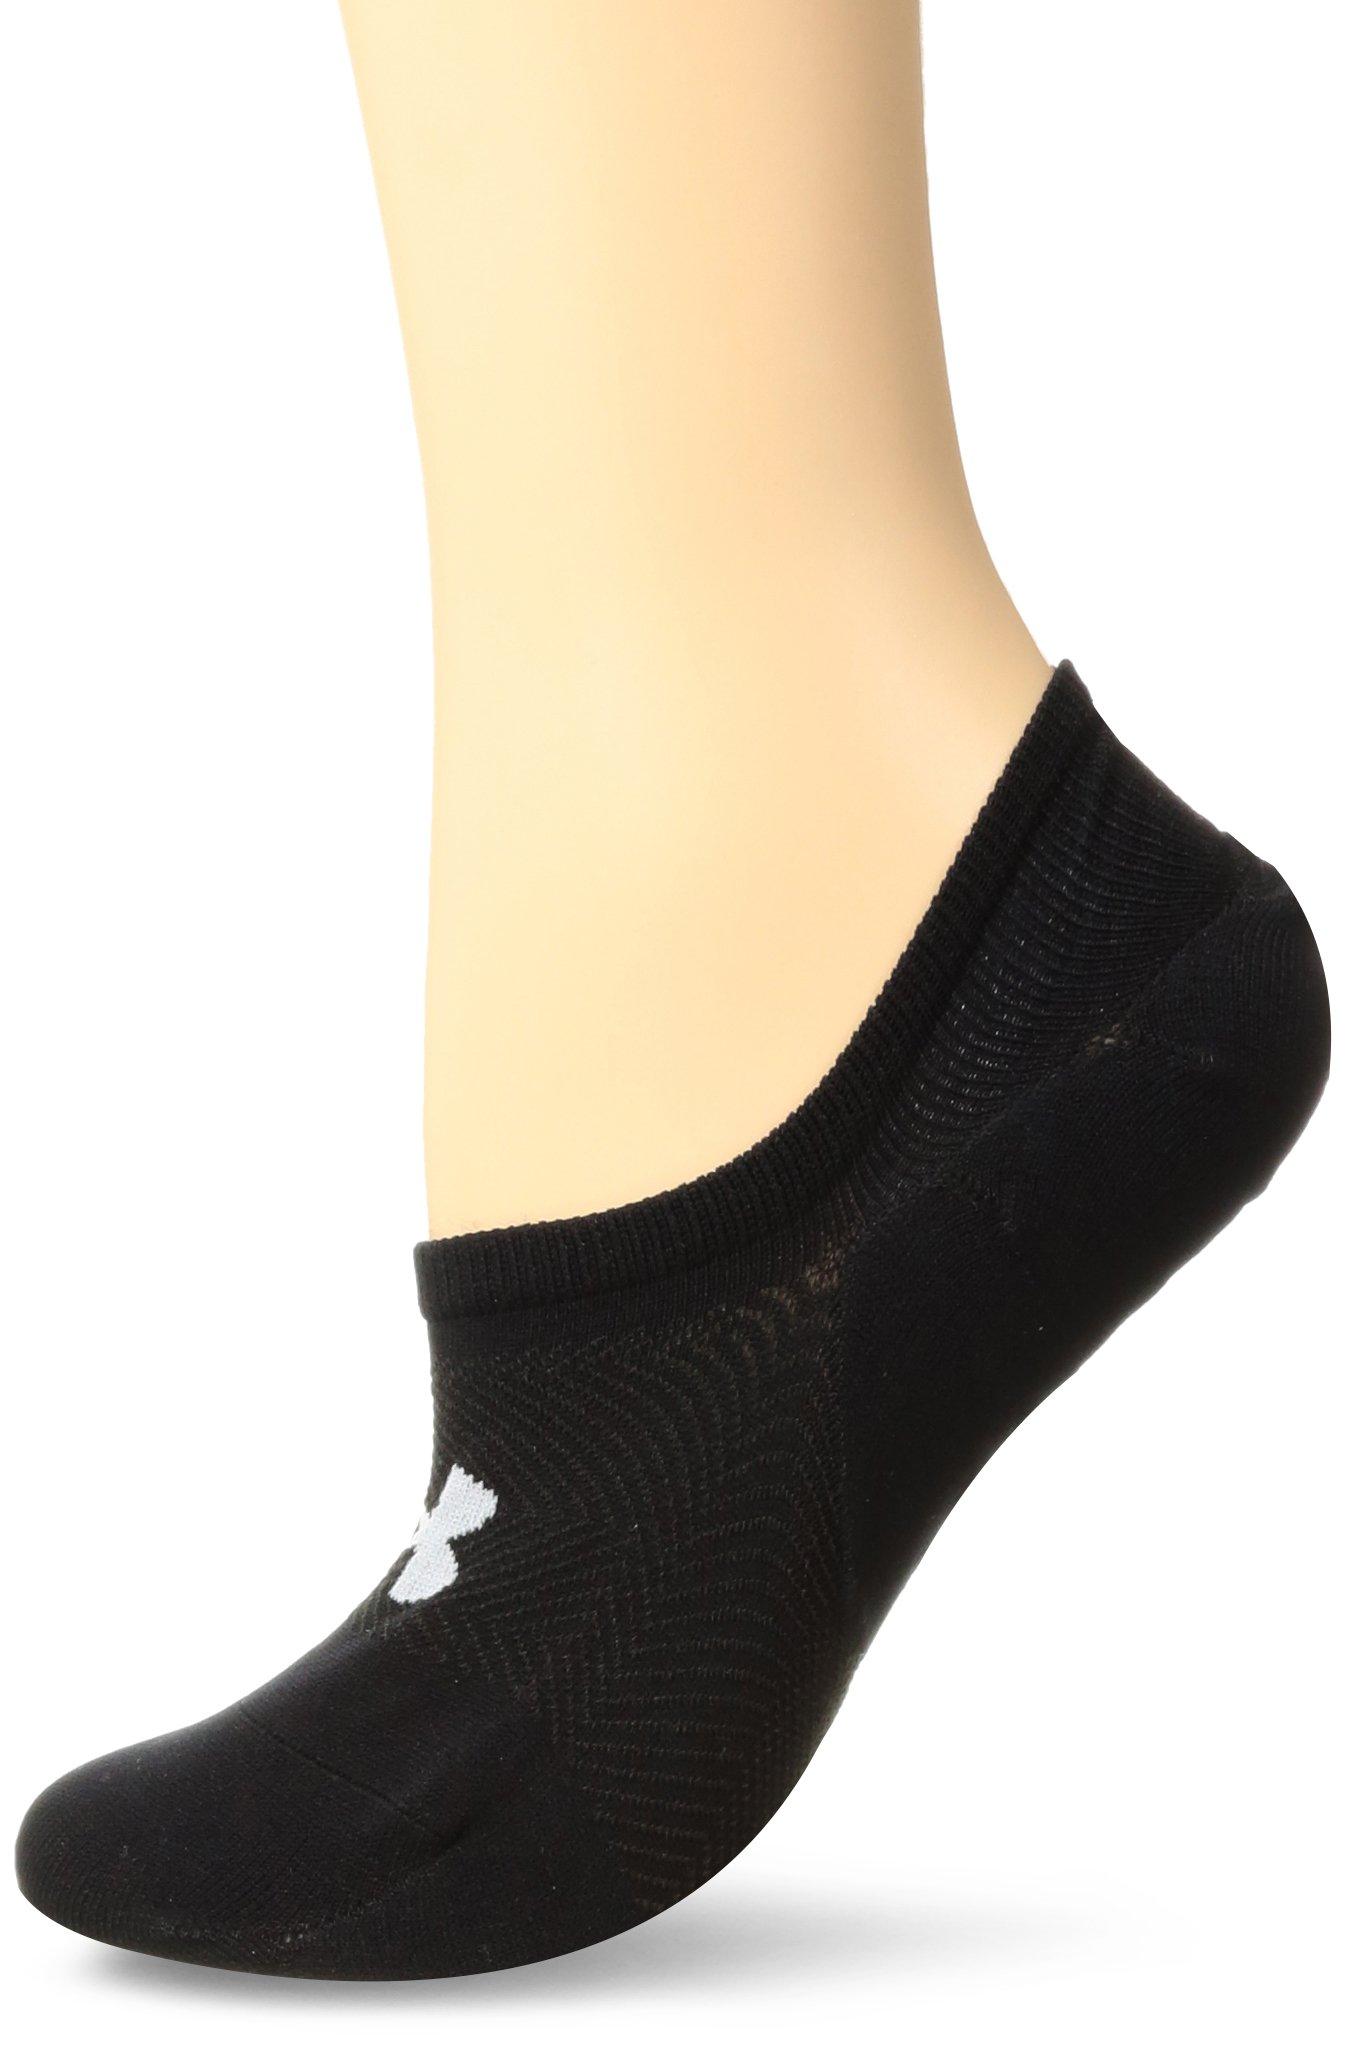 Under Armour Women's Essential Ultra Low Socks (3 Pack), Black, Medium